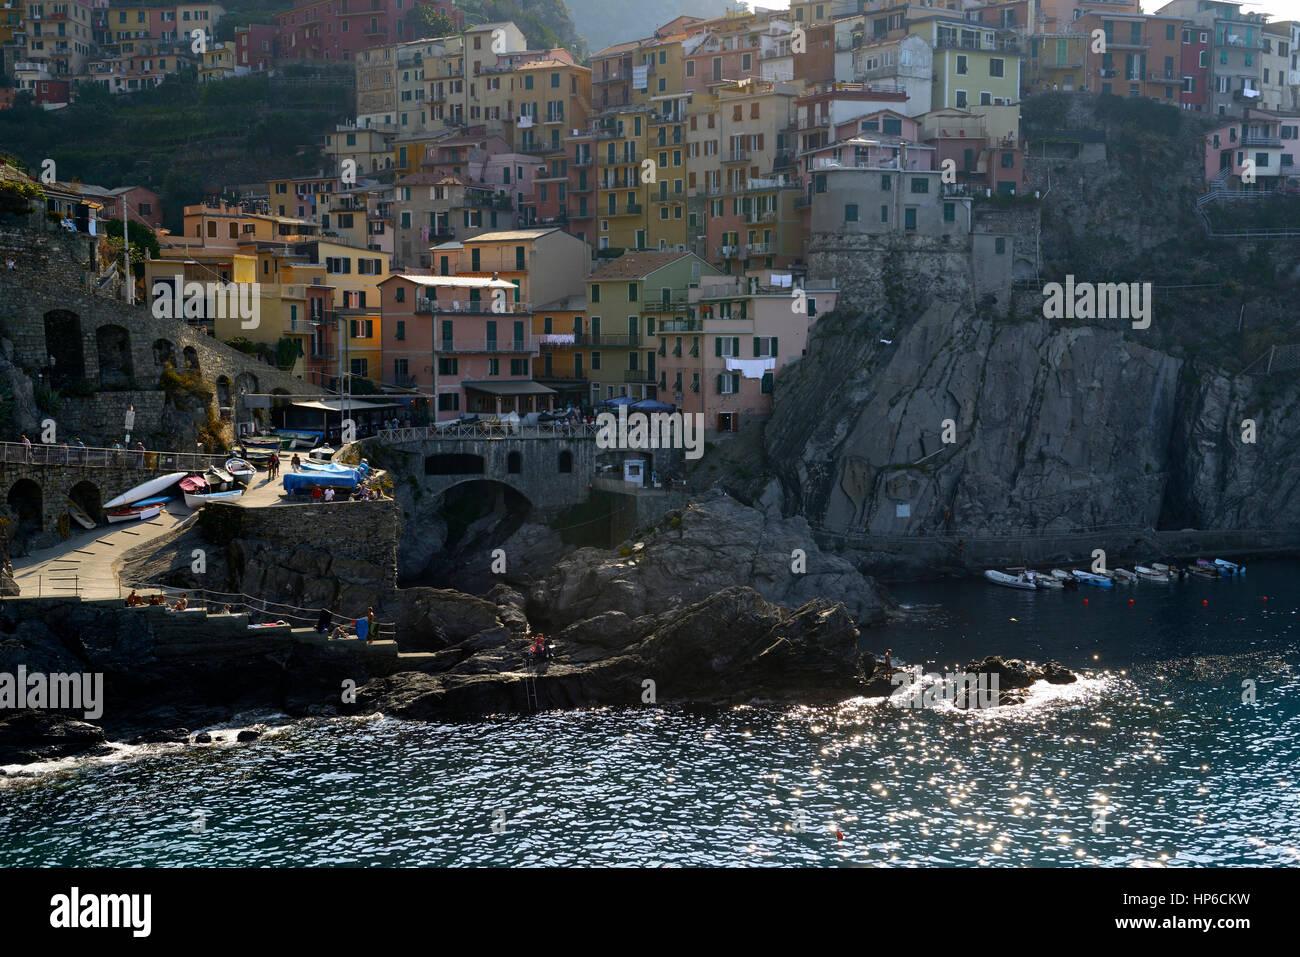 Manarolo, Cinque Terre, Coast, Coastline, Village, Villages, cliff, cliffs, clifftop, colourful, colorful, houses, Stock Photo